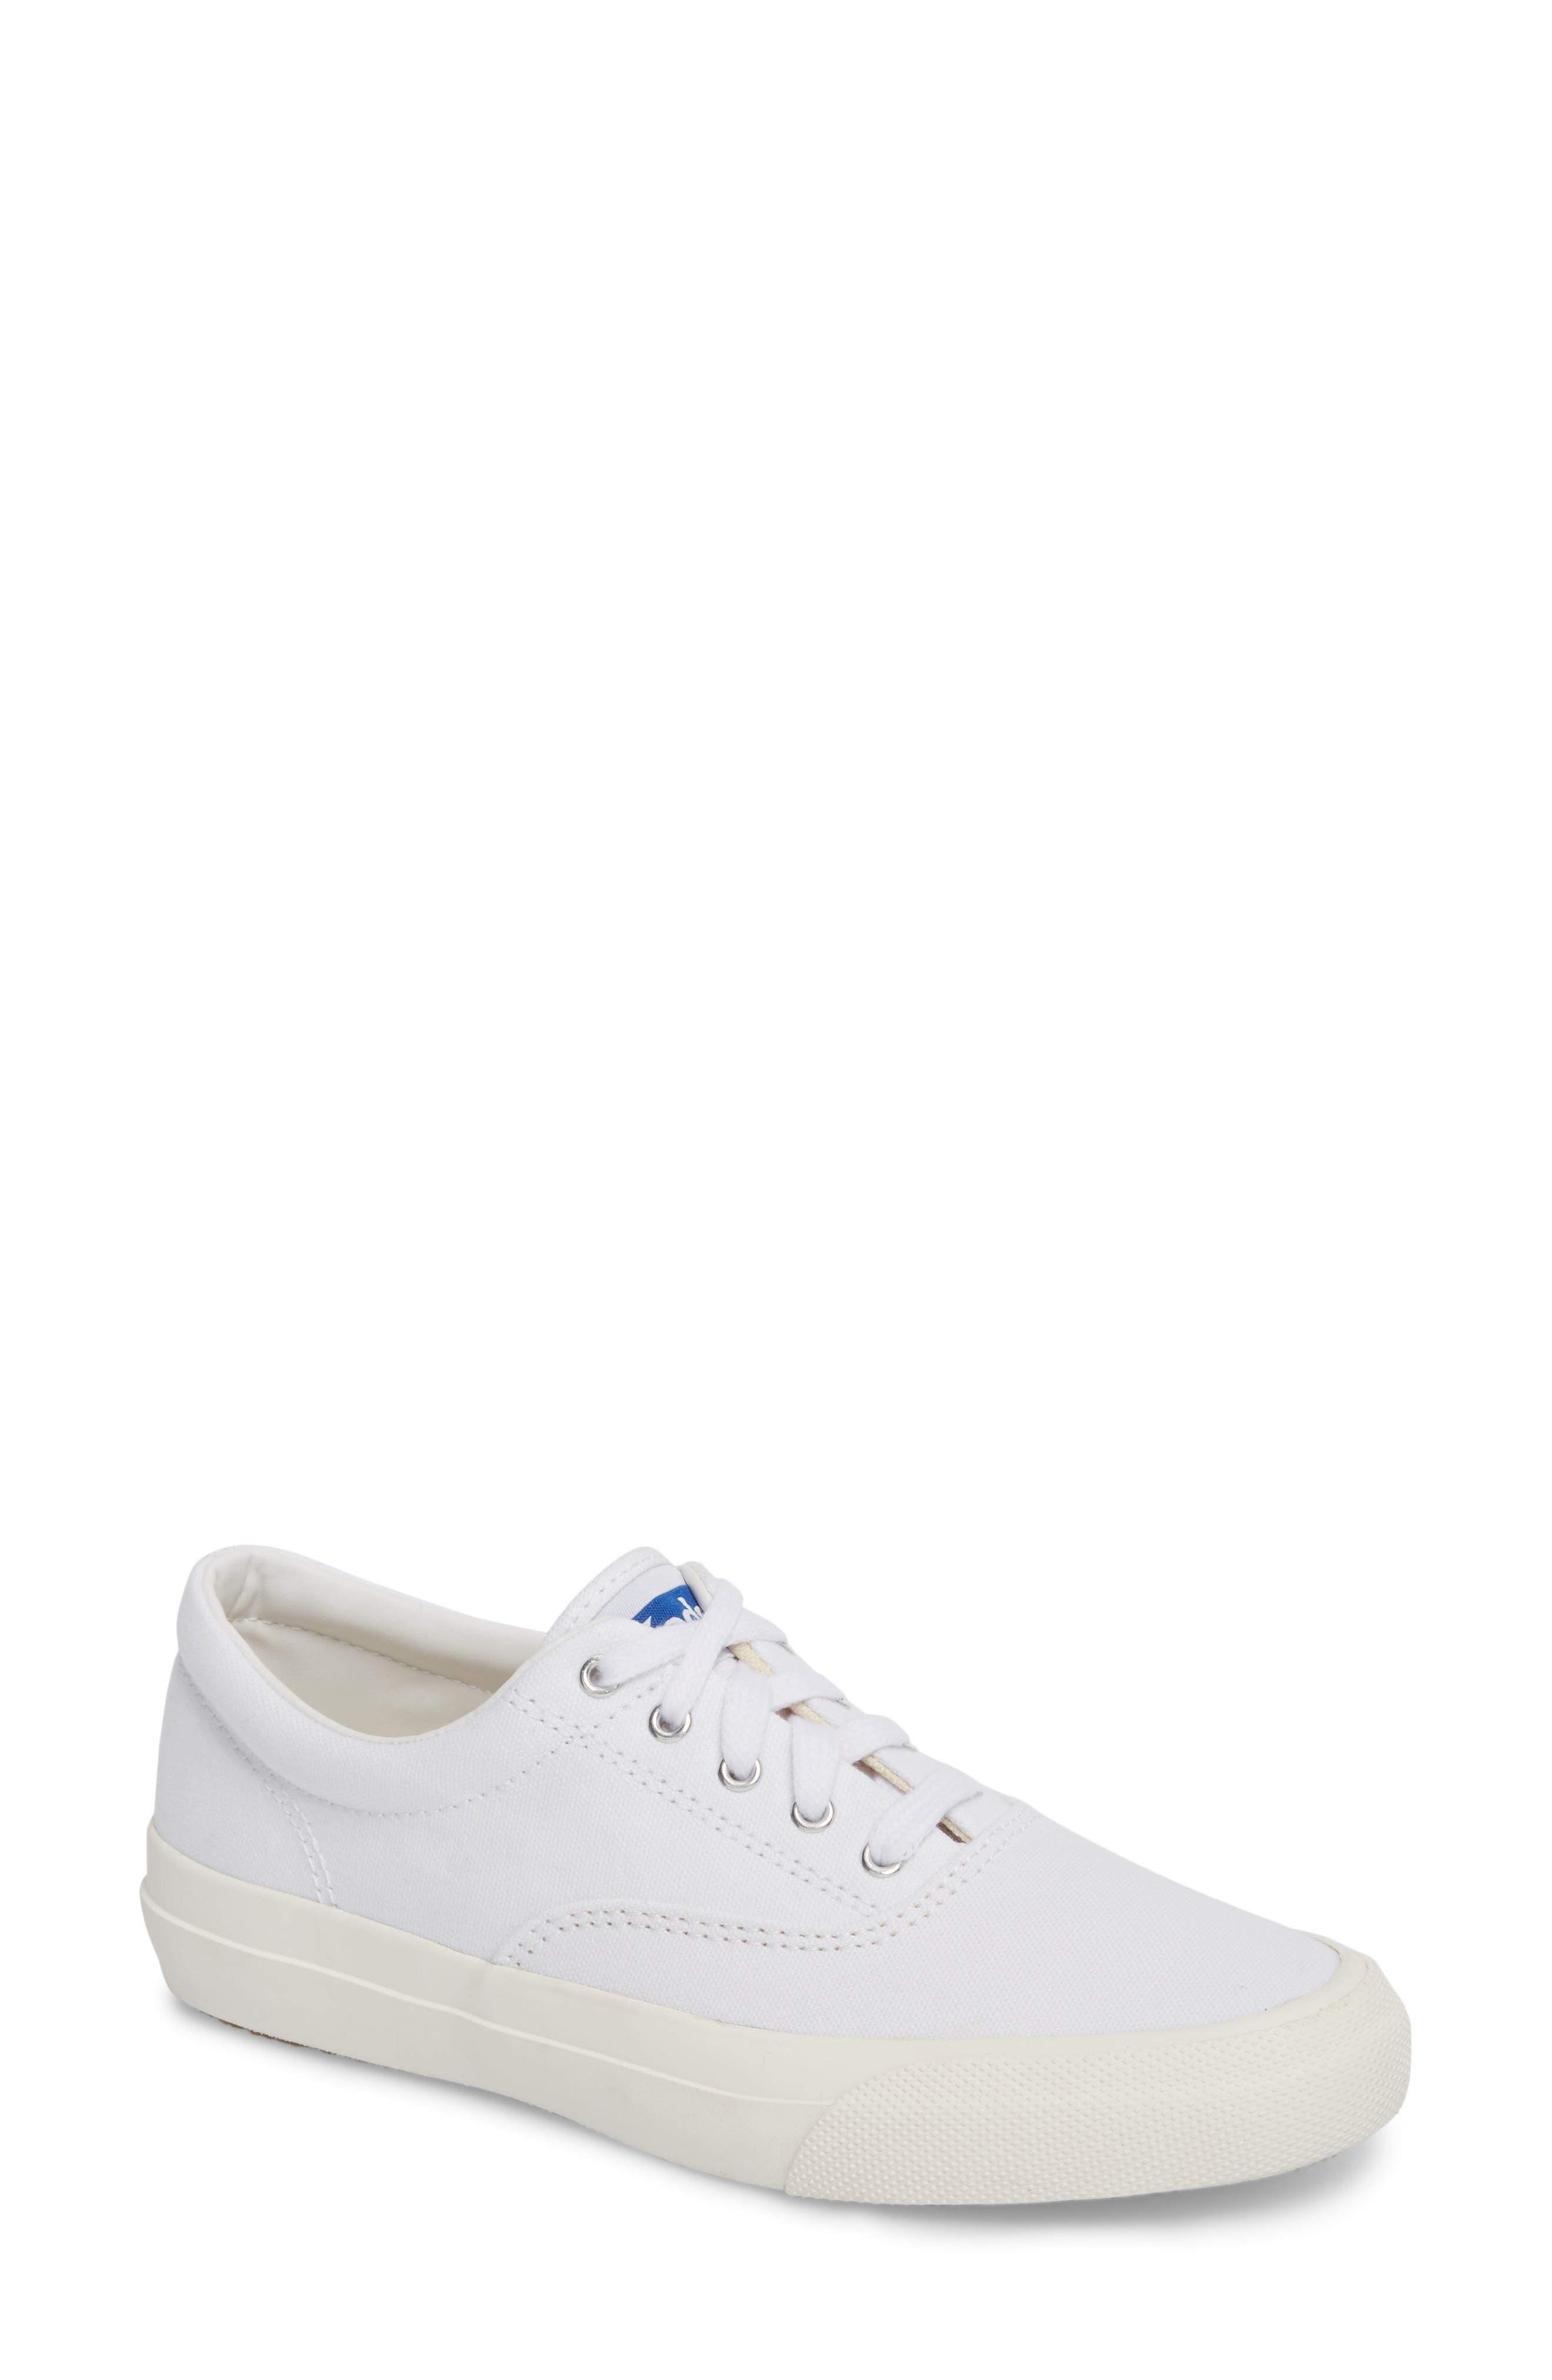 Anchor Sneaker,                         Main,                         color, White